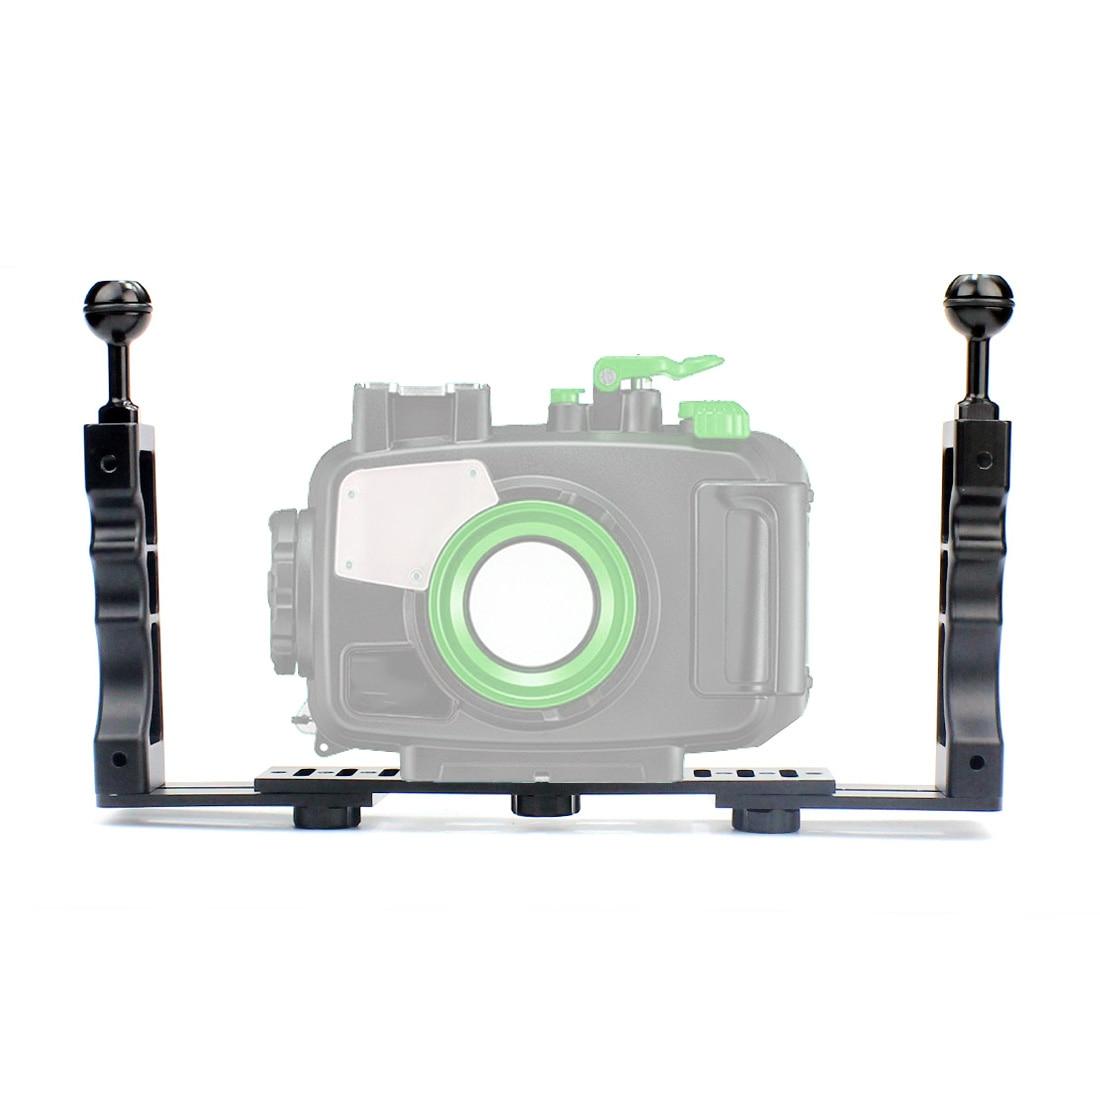 Mango de mano estabilizador de agarre de mano equipo submarino buceo bandeja montaje/luz LED para Gopro Cámara SJCAM Smartphone